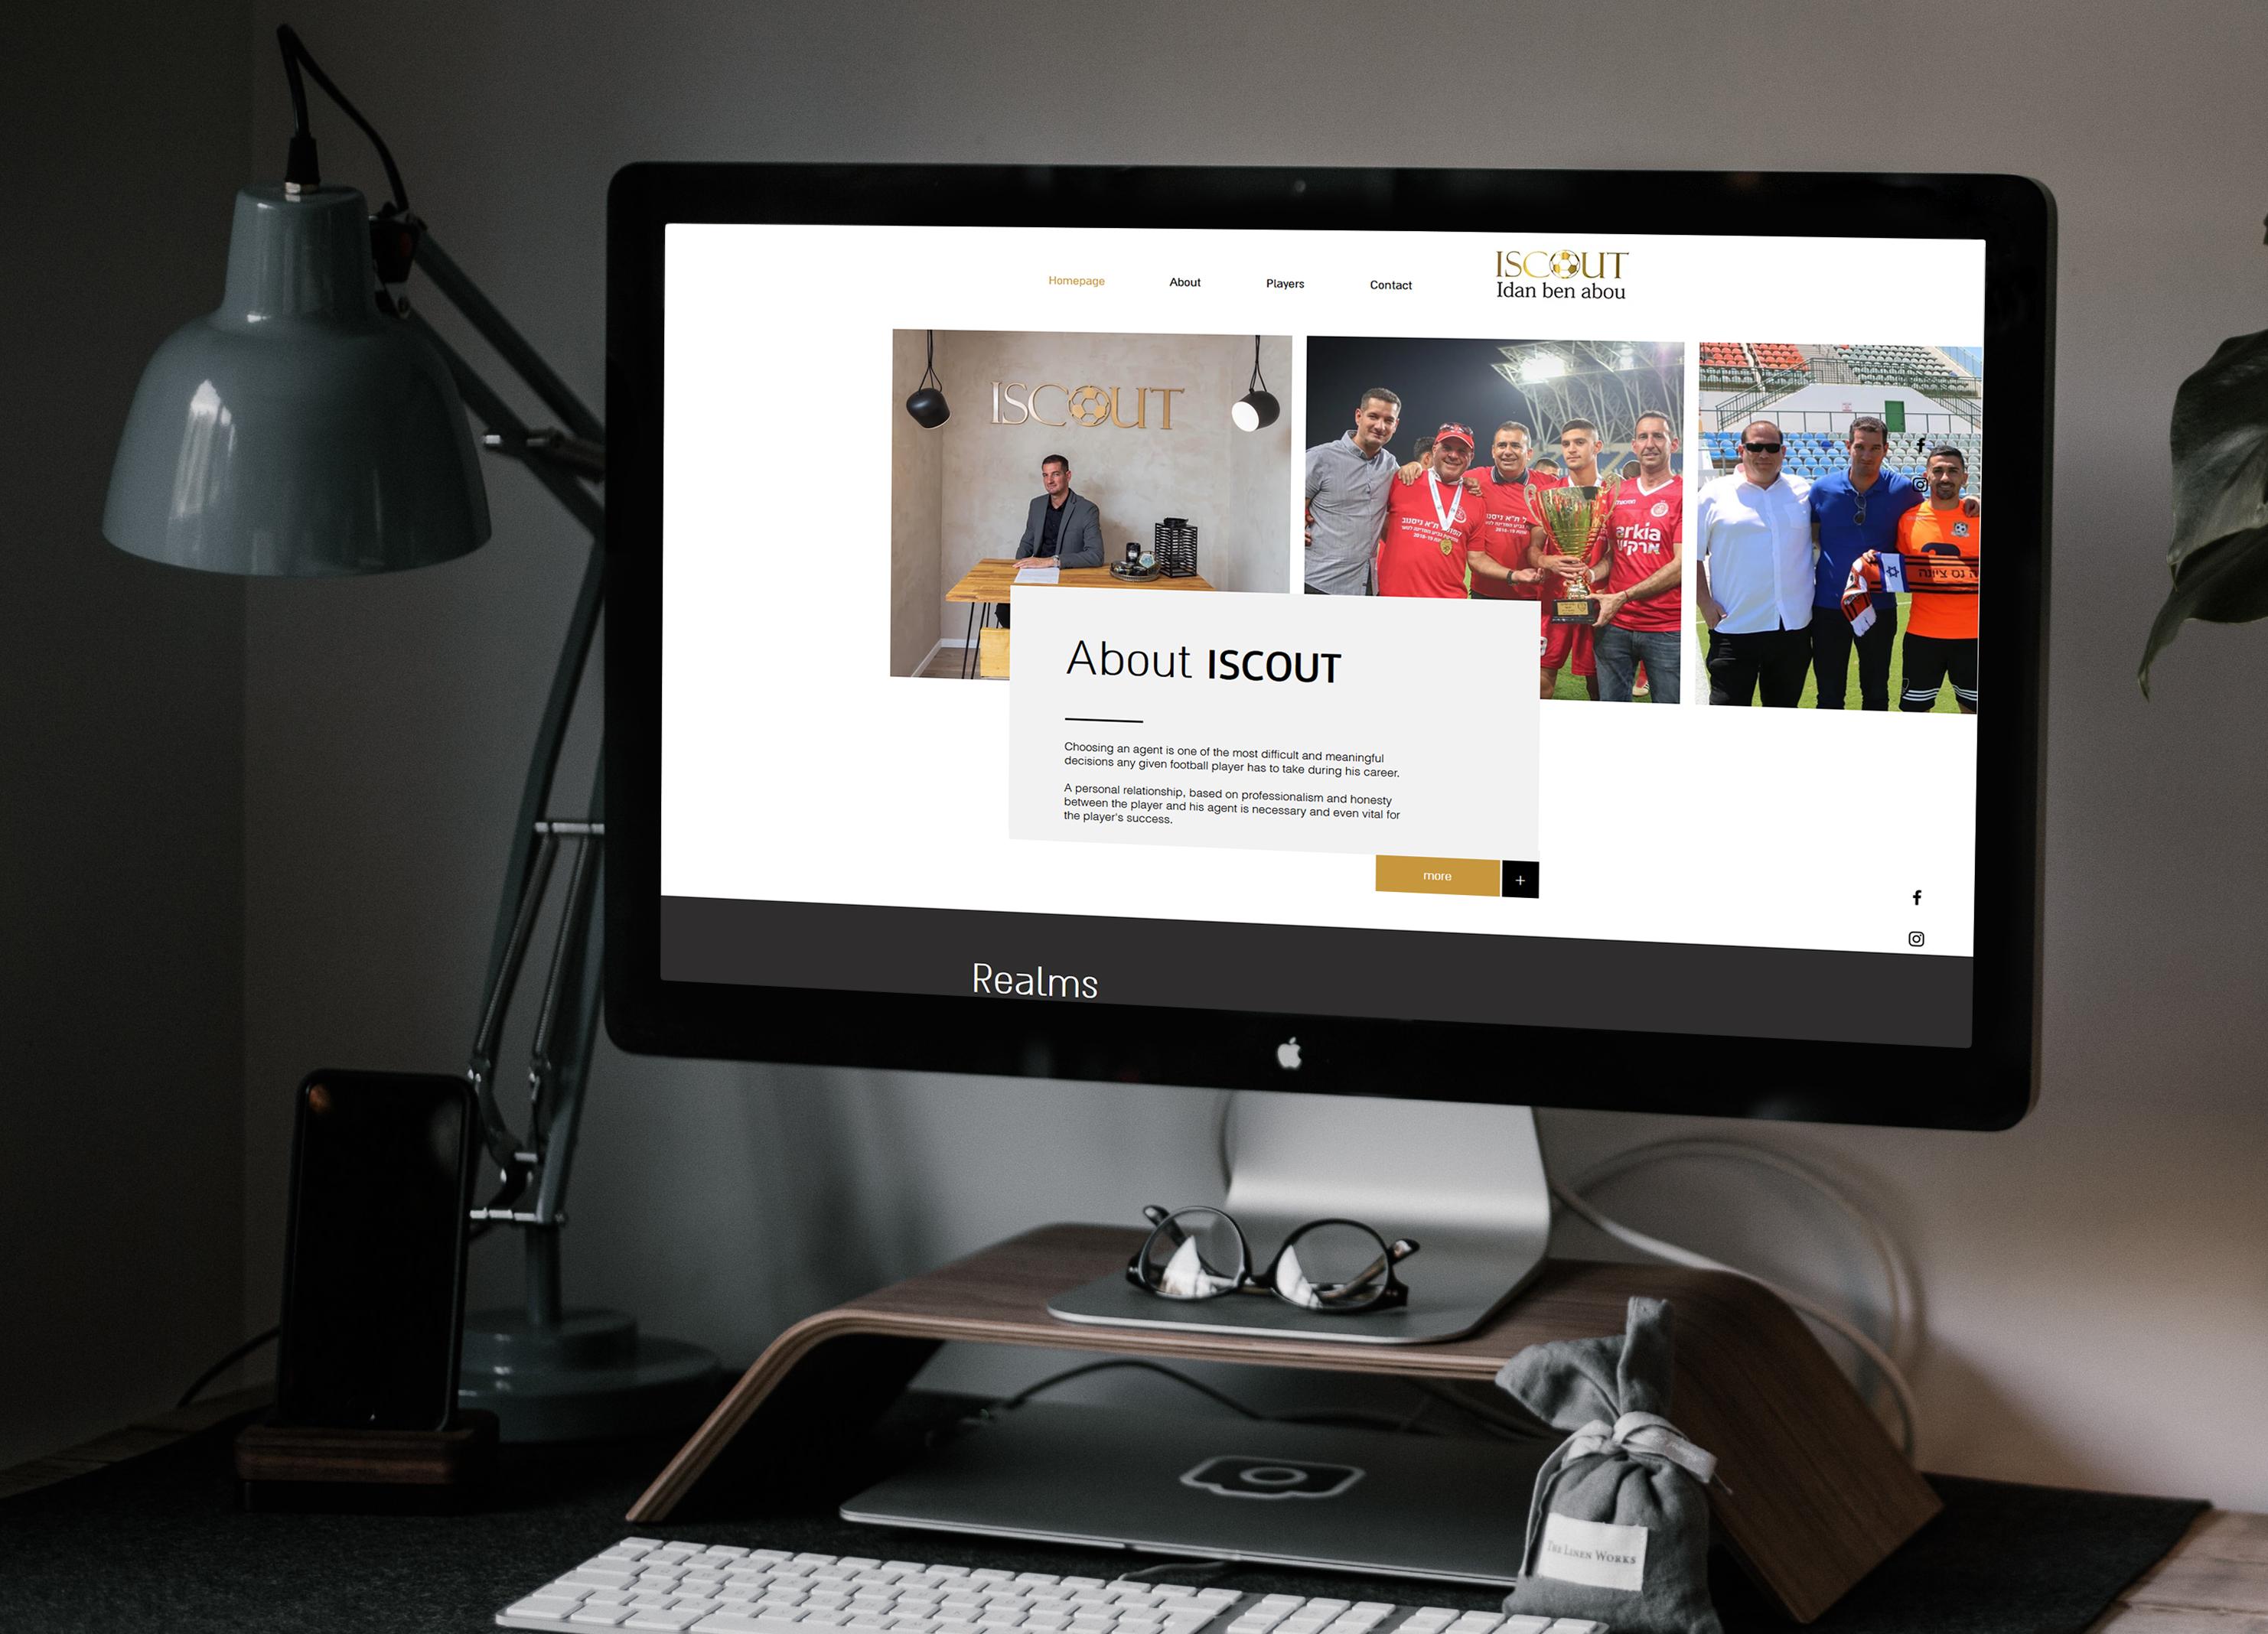 ISCOUT - מיתוג ועיצוב אתר -עידן בן אבו